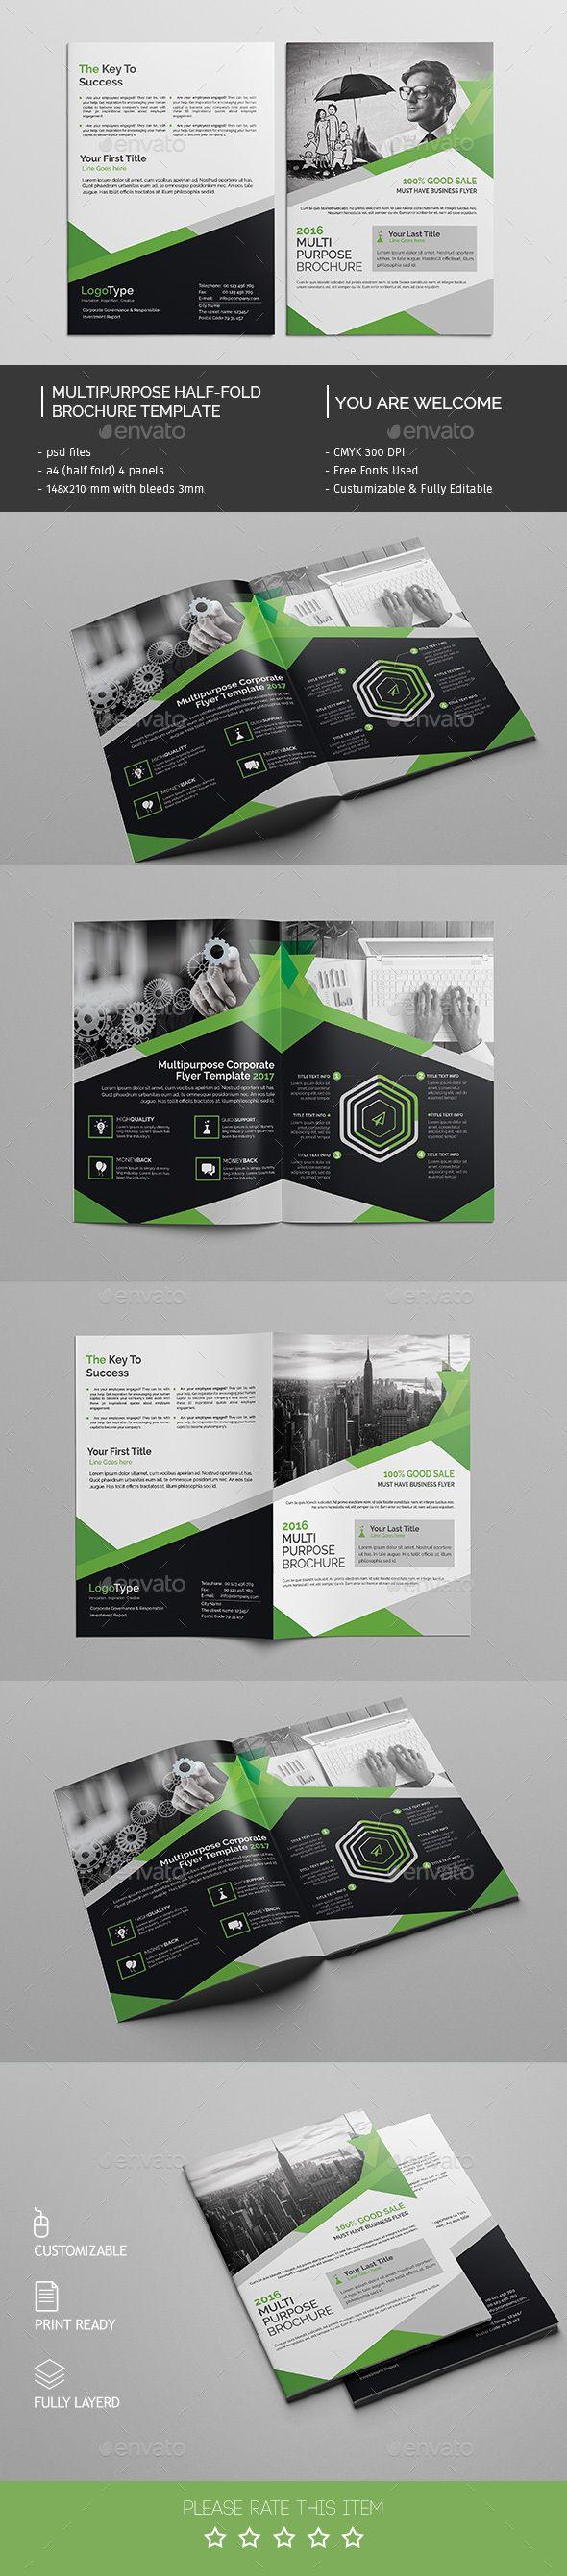 Corporate Bifold Brochure Template PSD #design Download: http://graphicriver.net/item/corporate-bifold-brochure-template/14548903?ref=ksioks